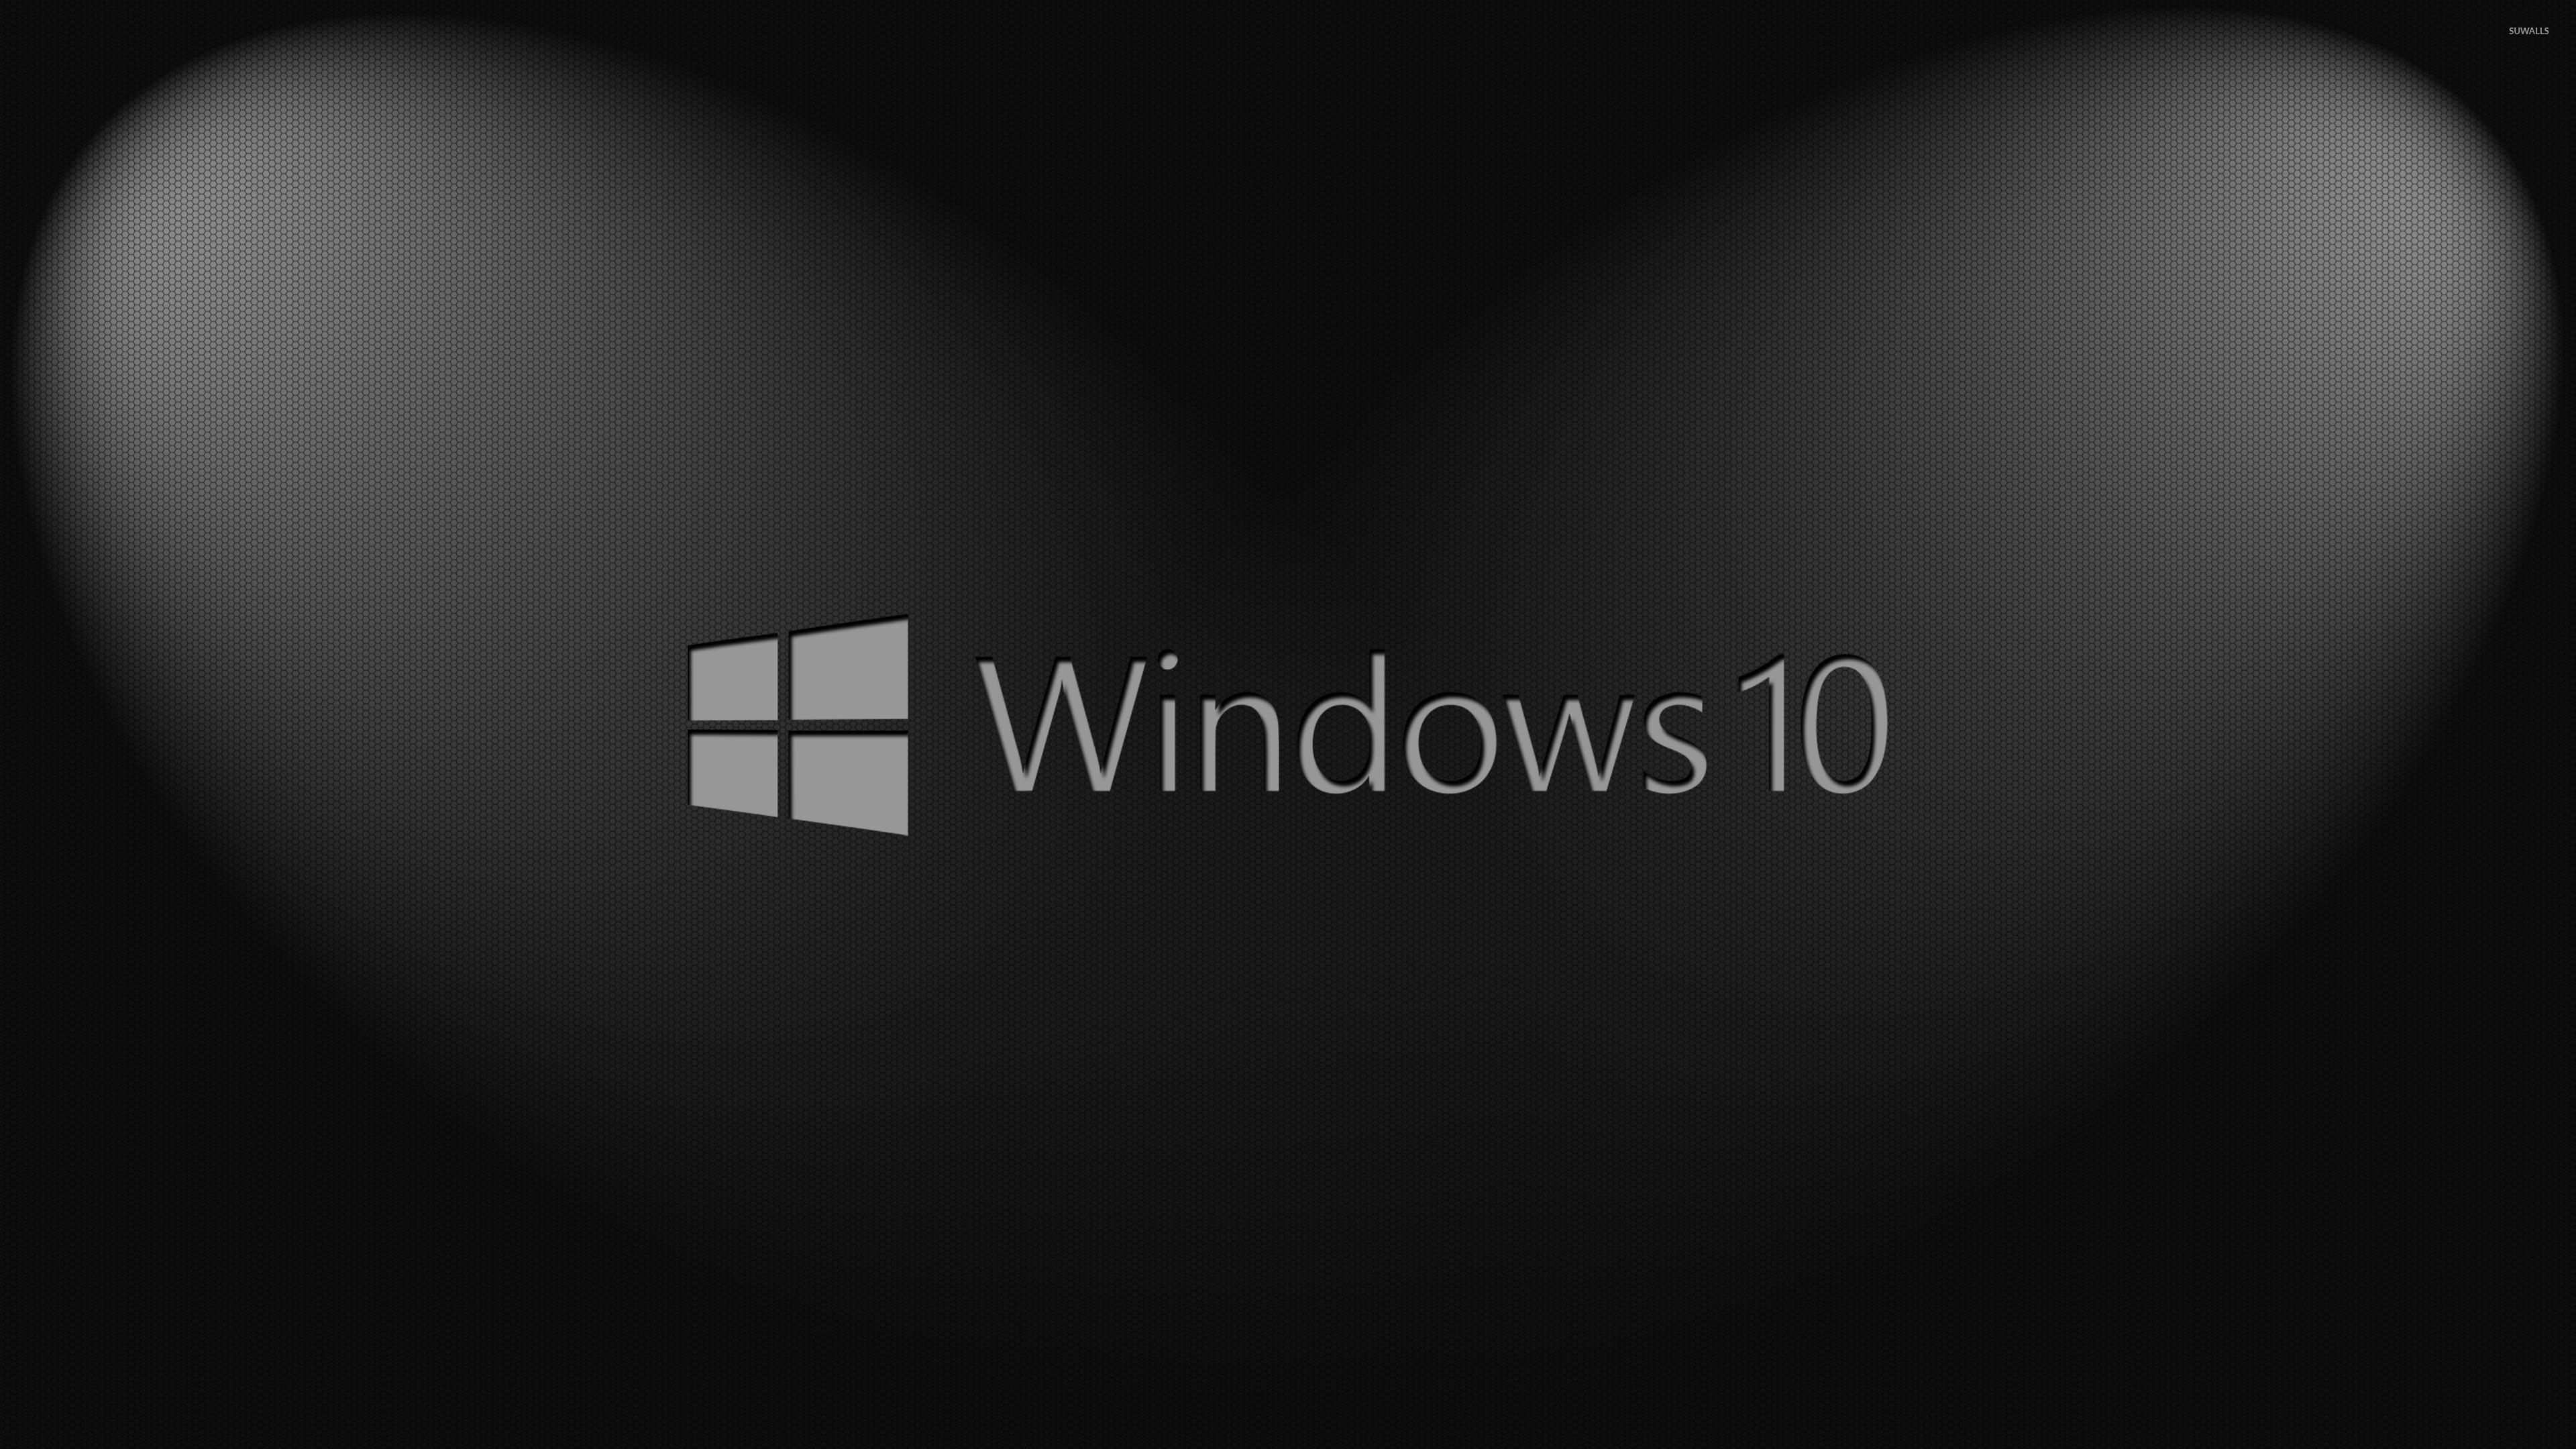 Windows 10 Gray Text Logo On Hexagon Pattern Wallpaper